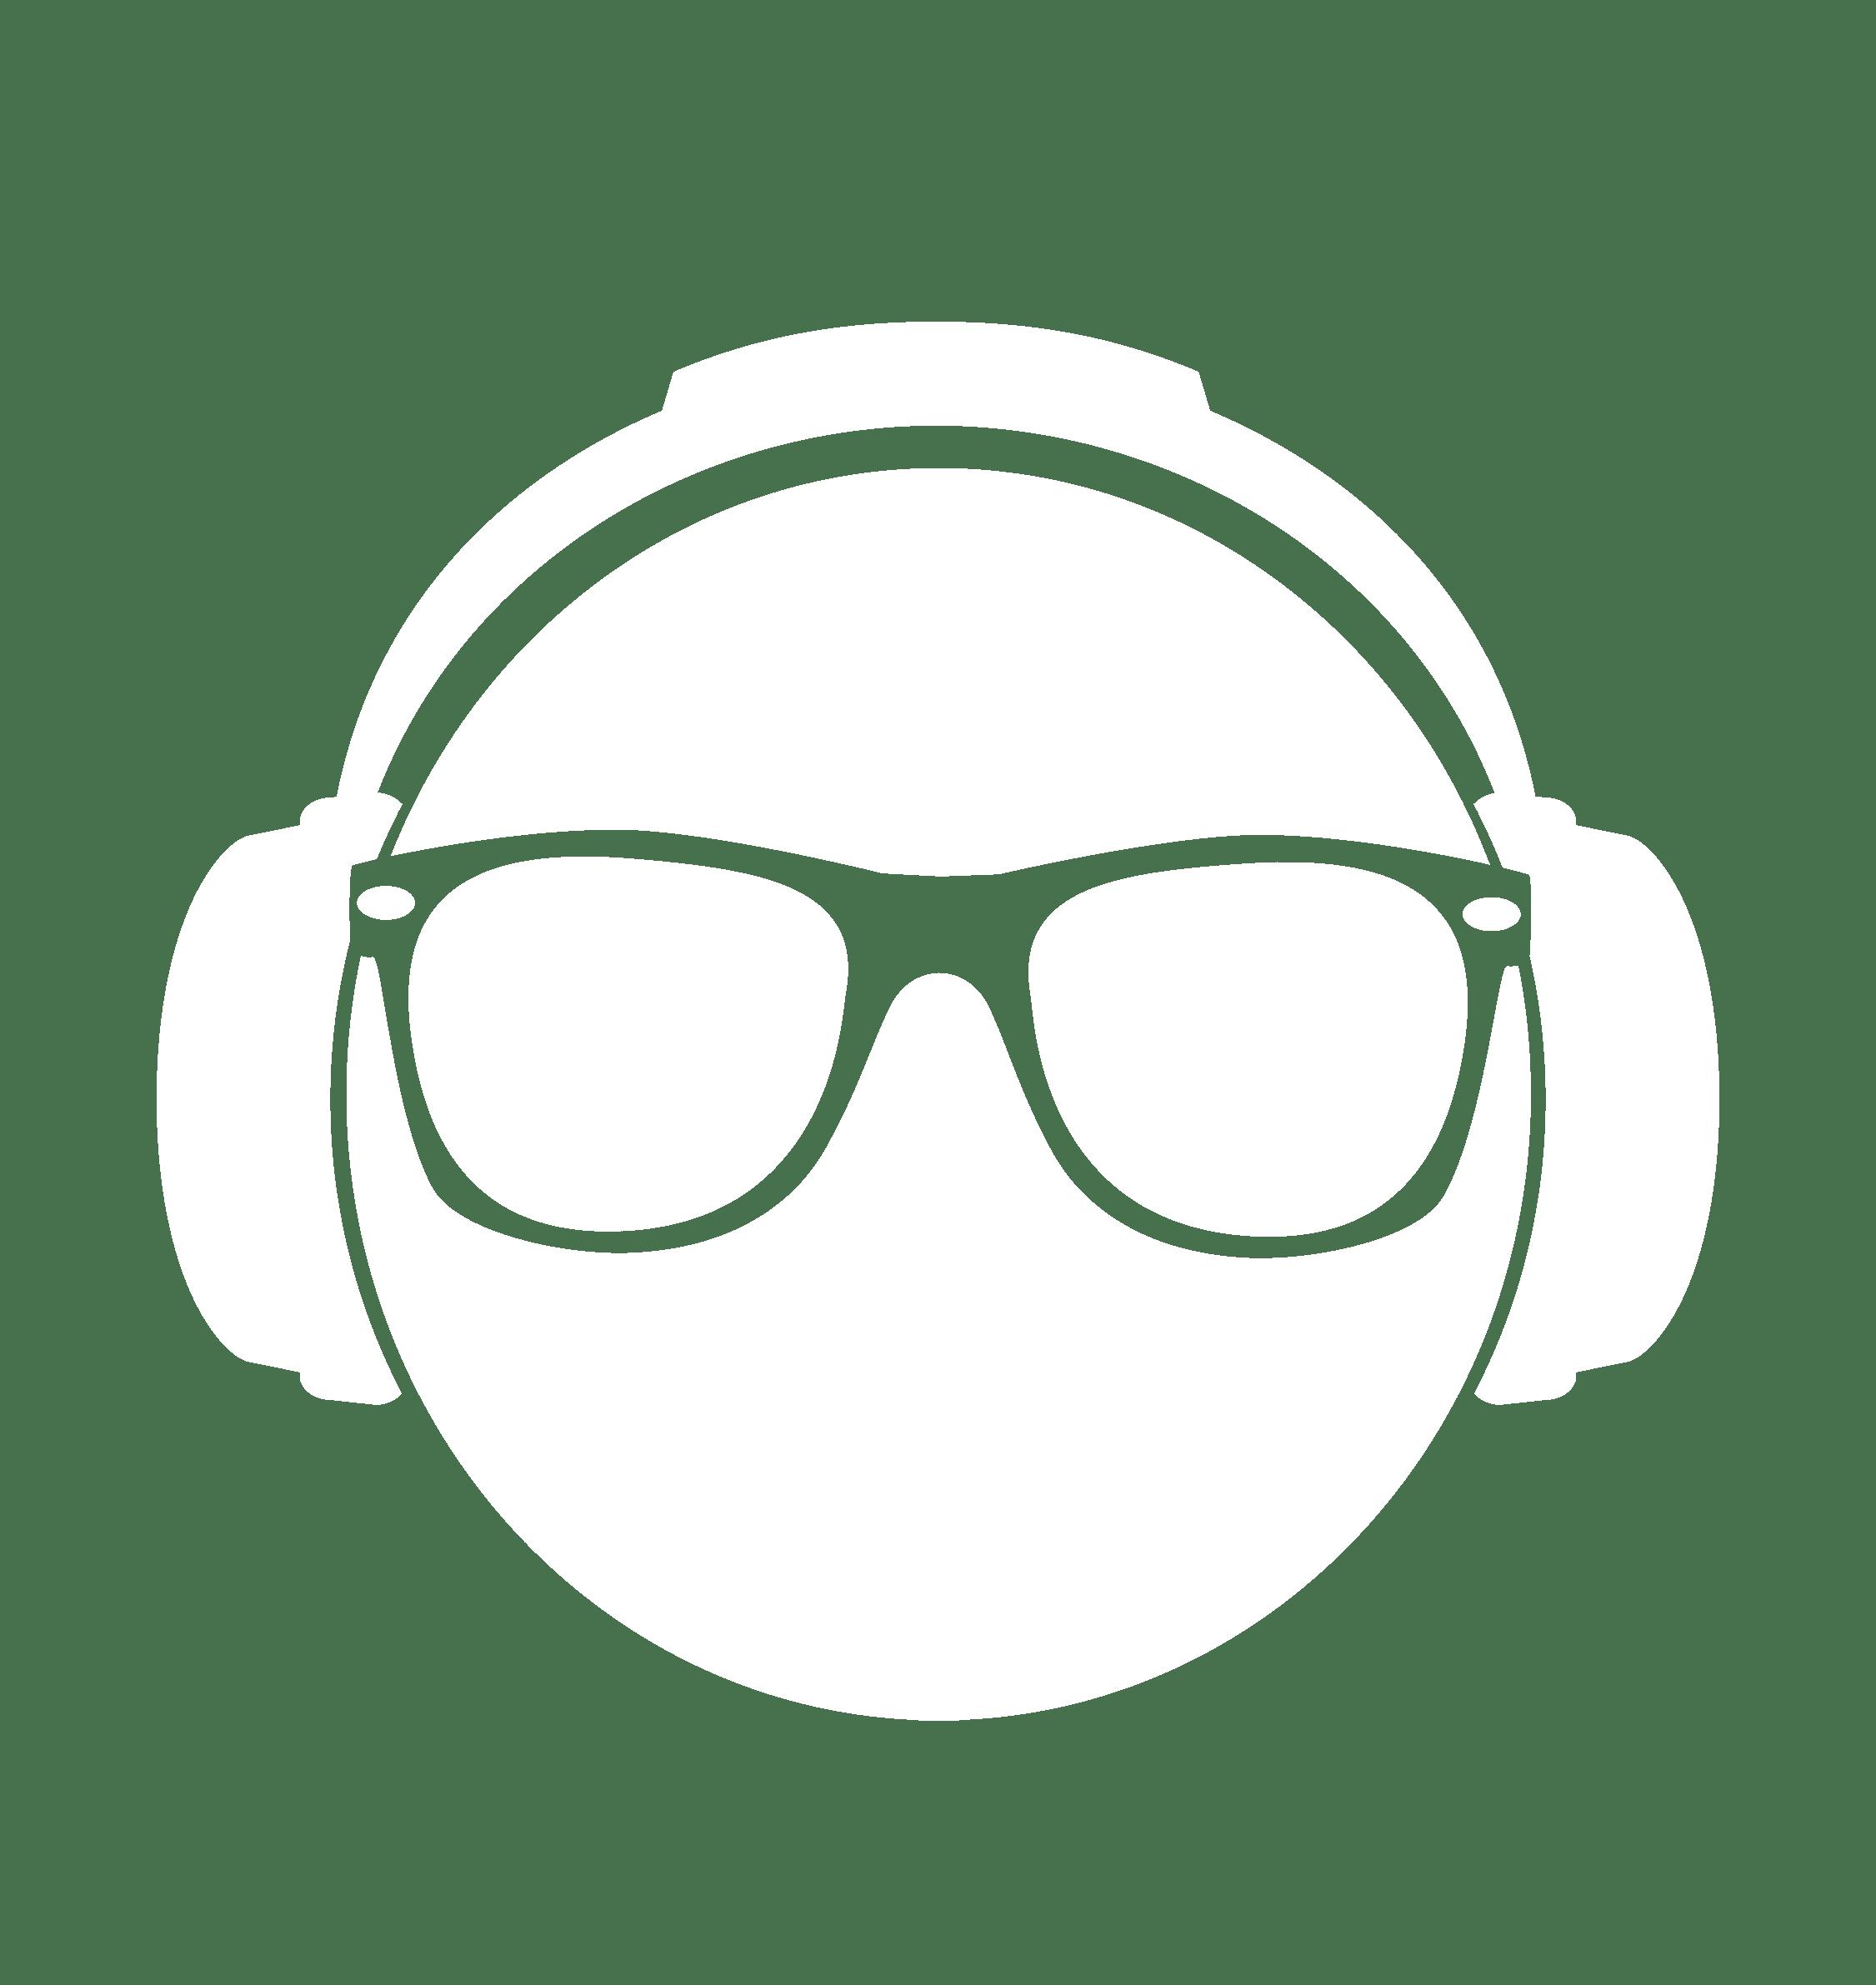 Dj clipart head phone. Silent disco djs headphone